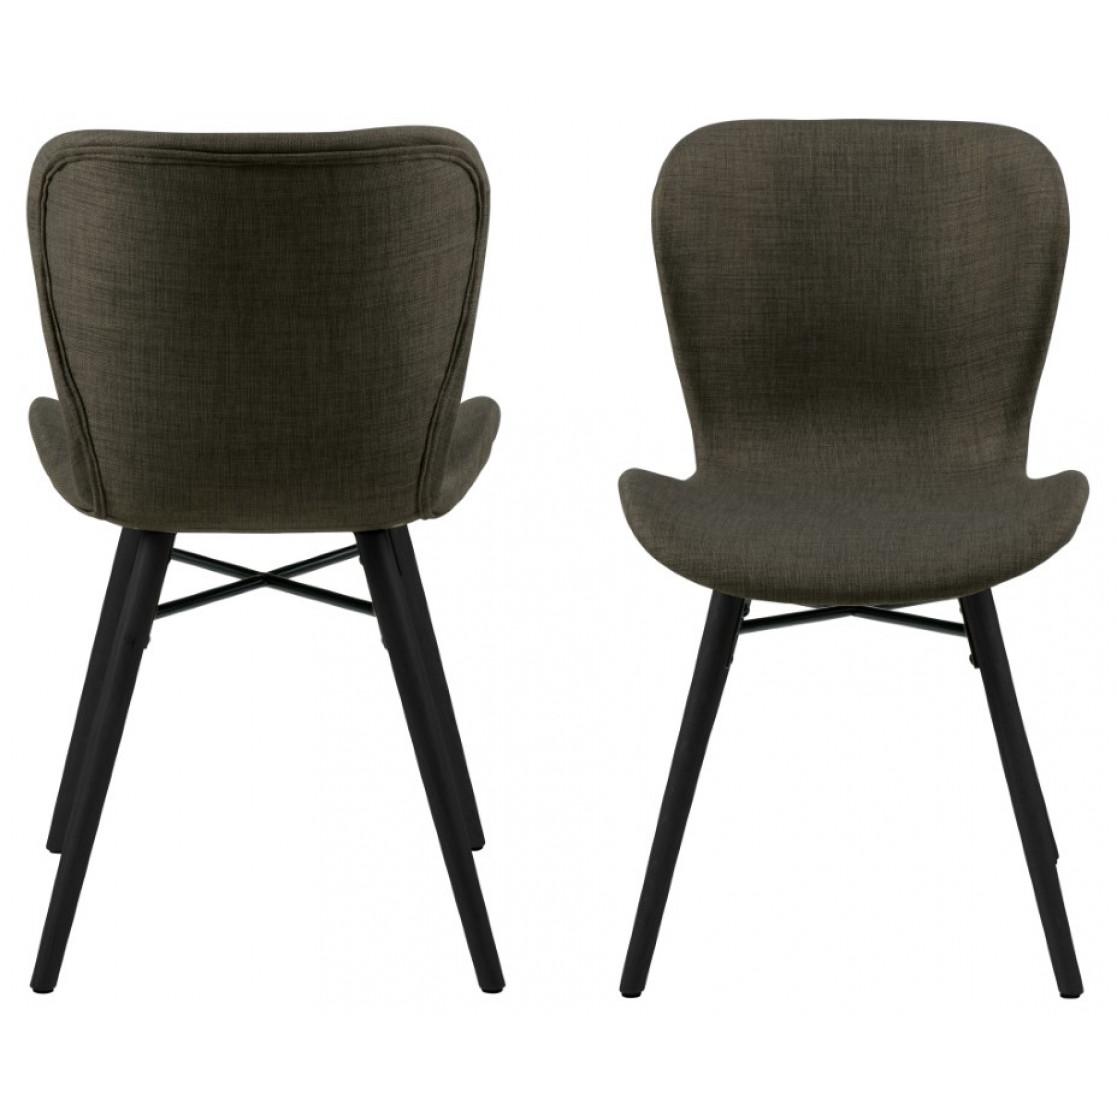 Set of 2 Chairs Matilda-A1 | Khaki & Black